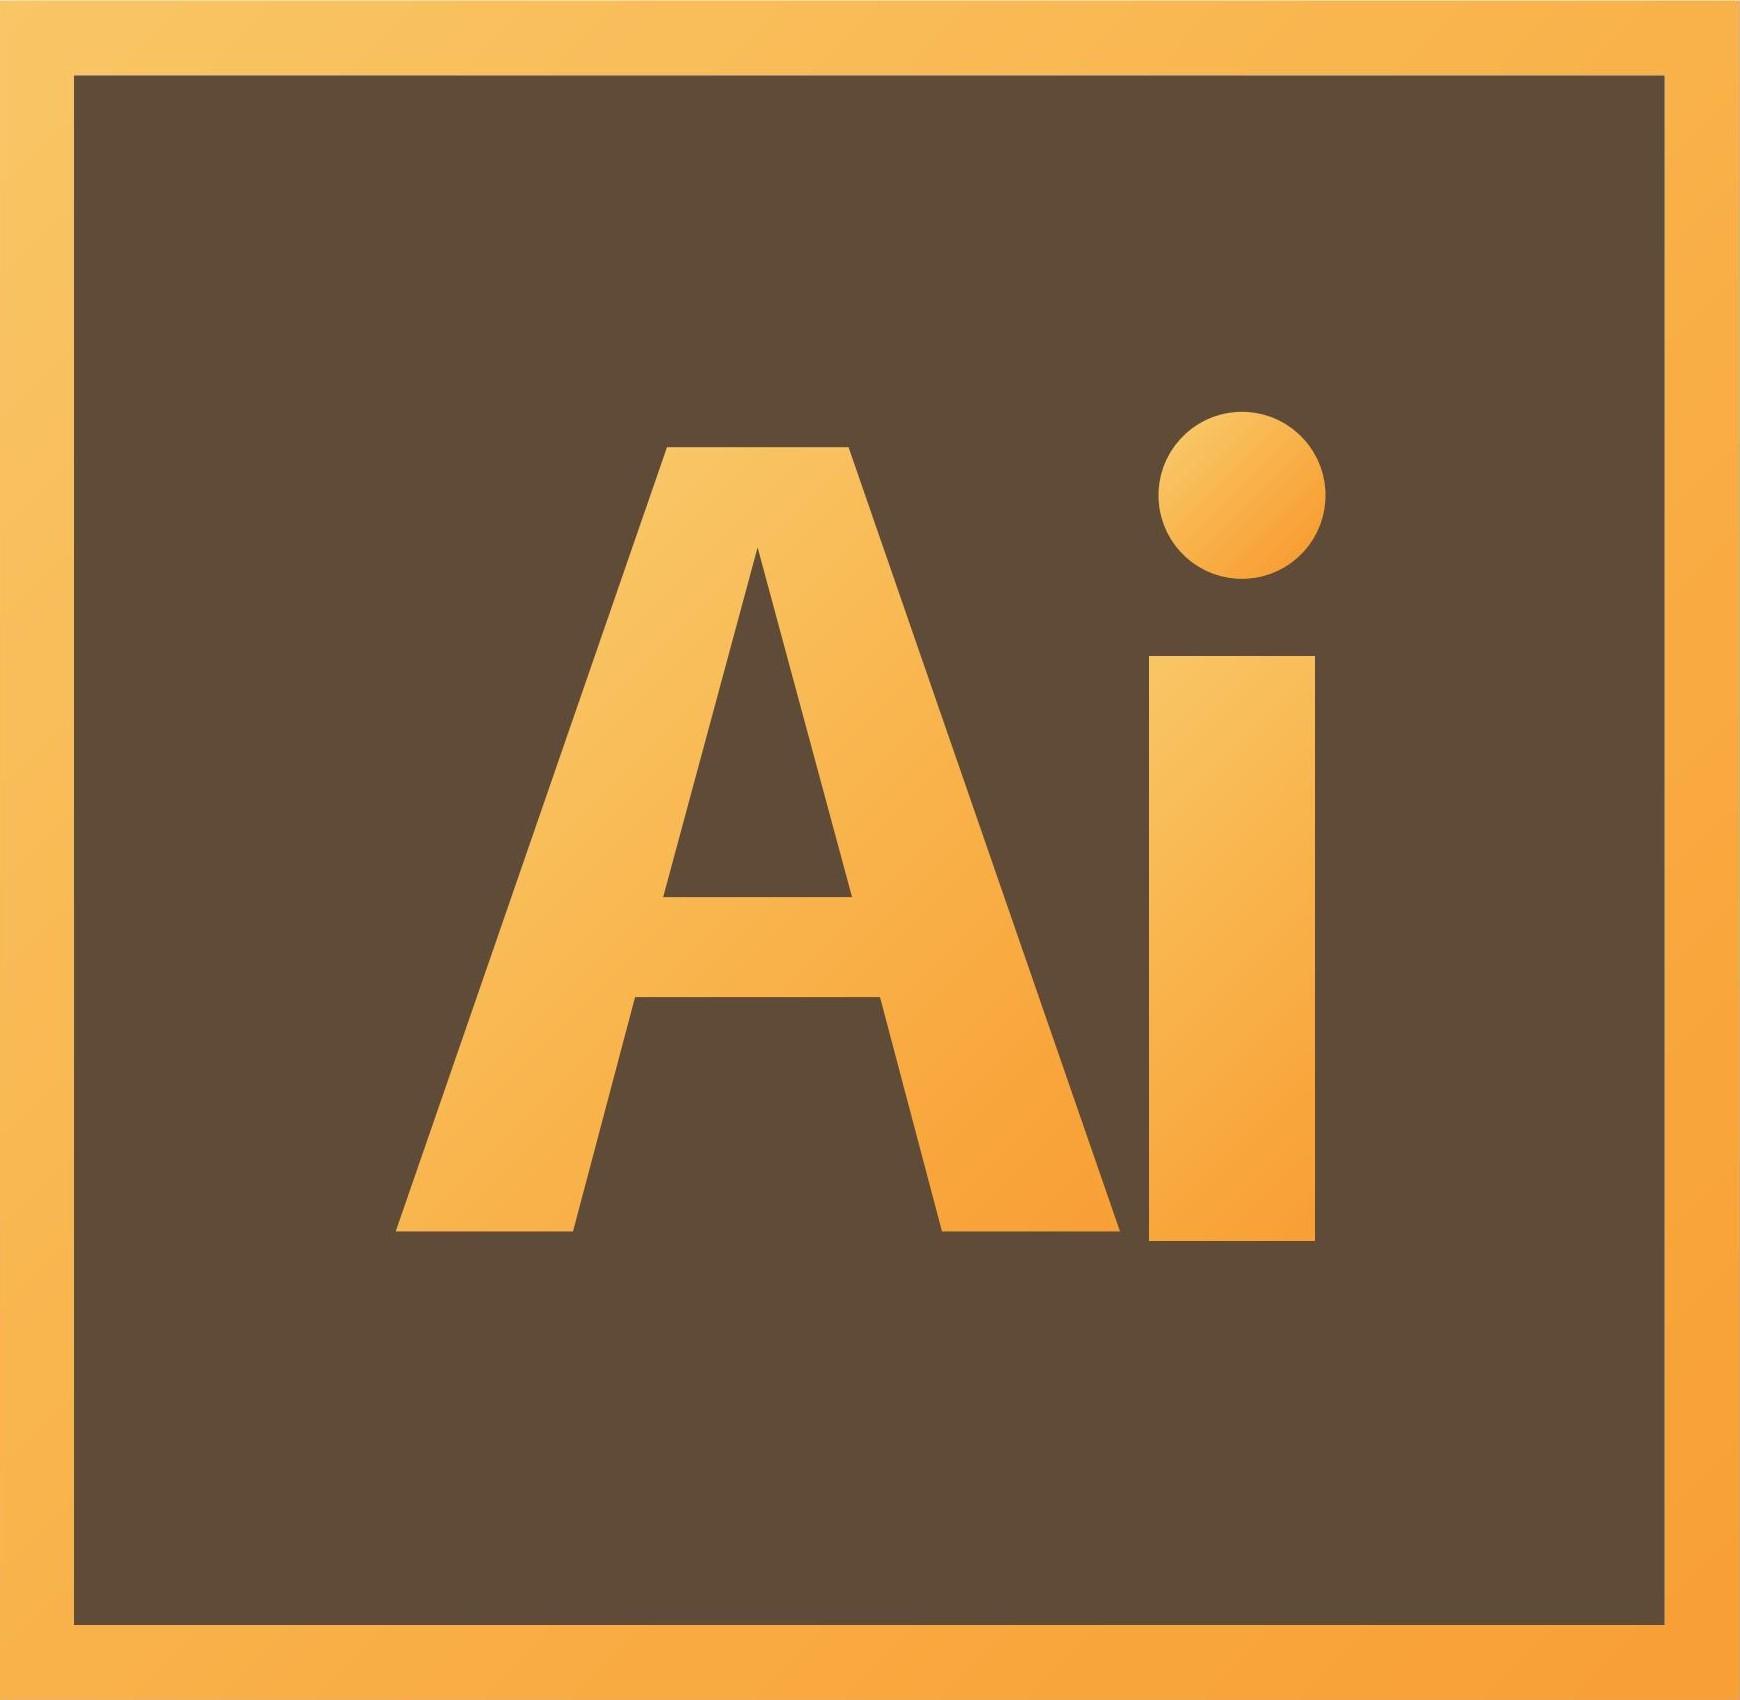 Adobe-Illustrator-Logo.jpg